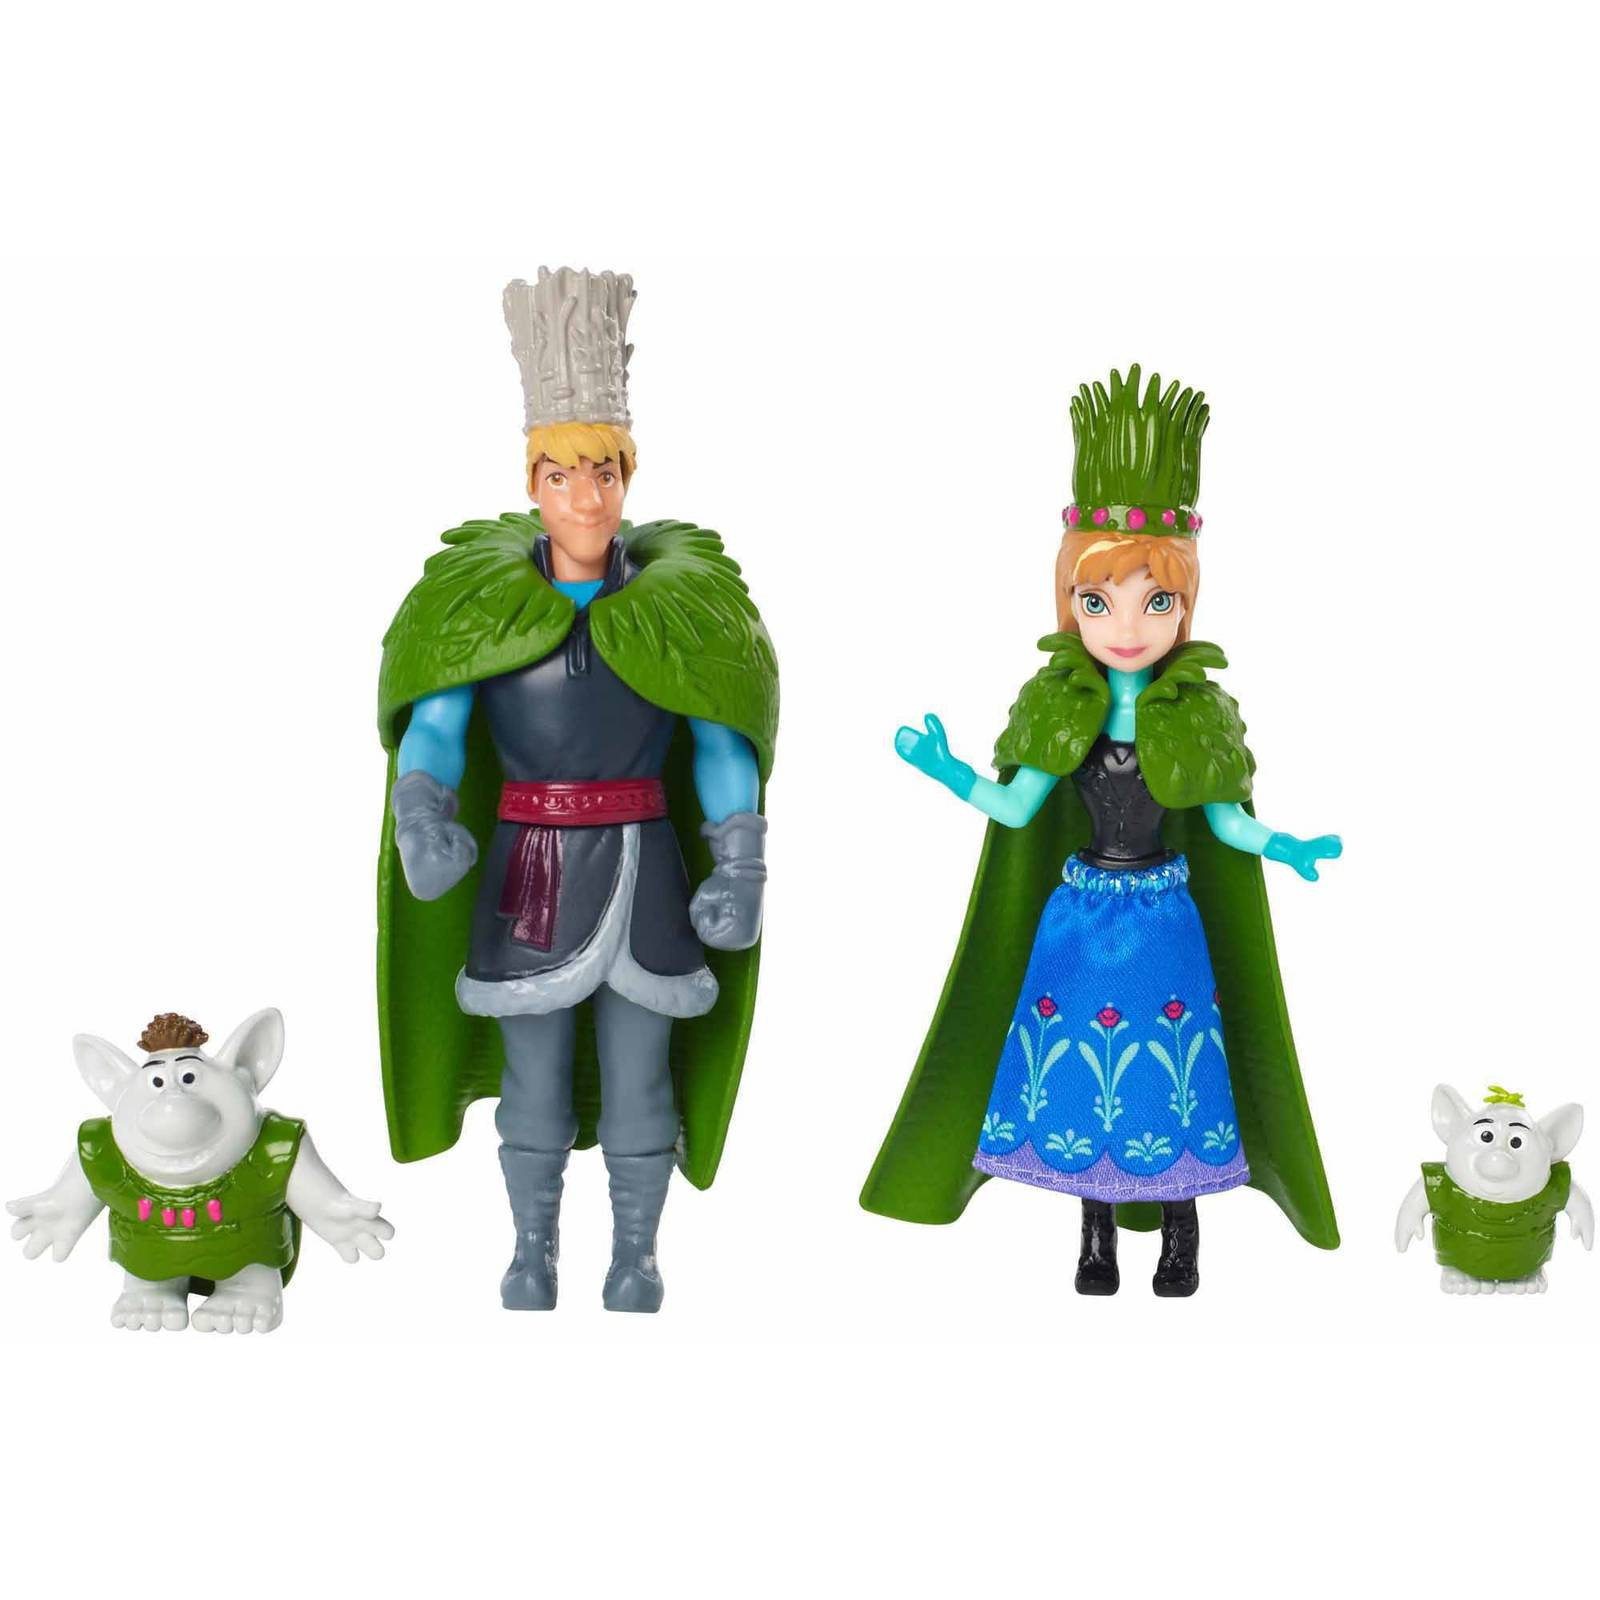 Disney Frozen Troll Wedding Small Doll Set image